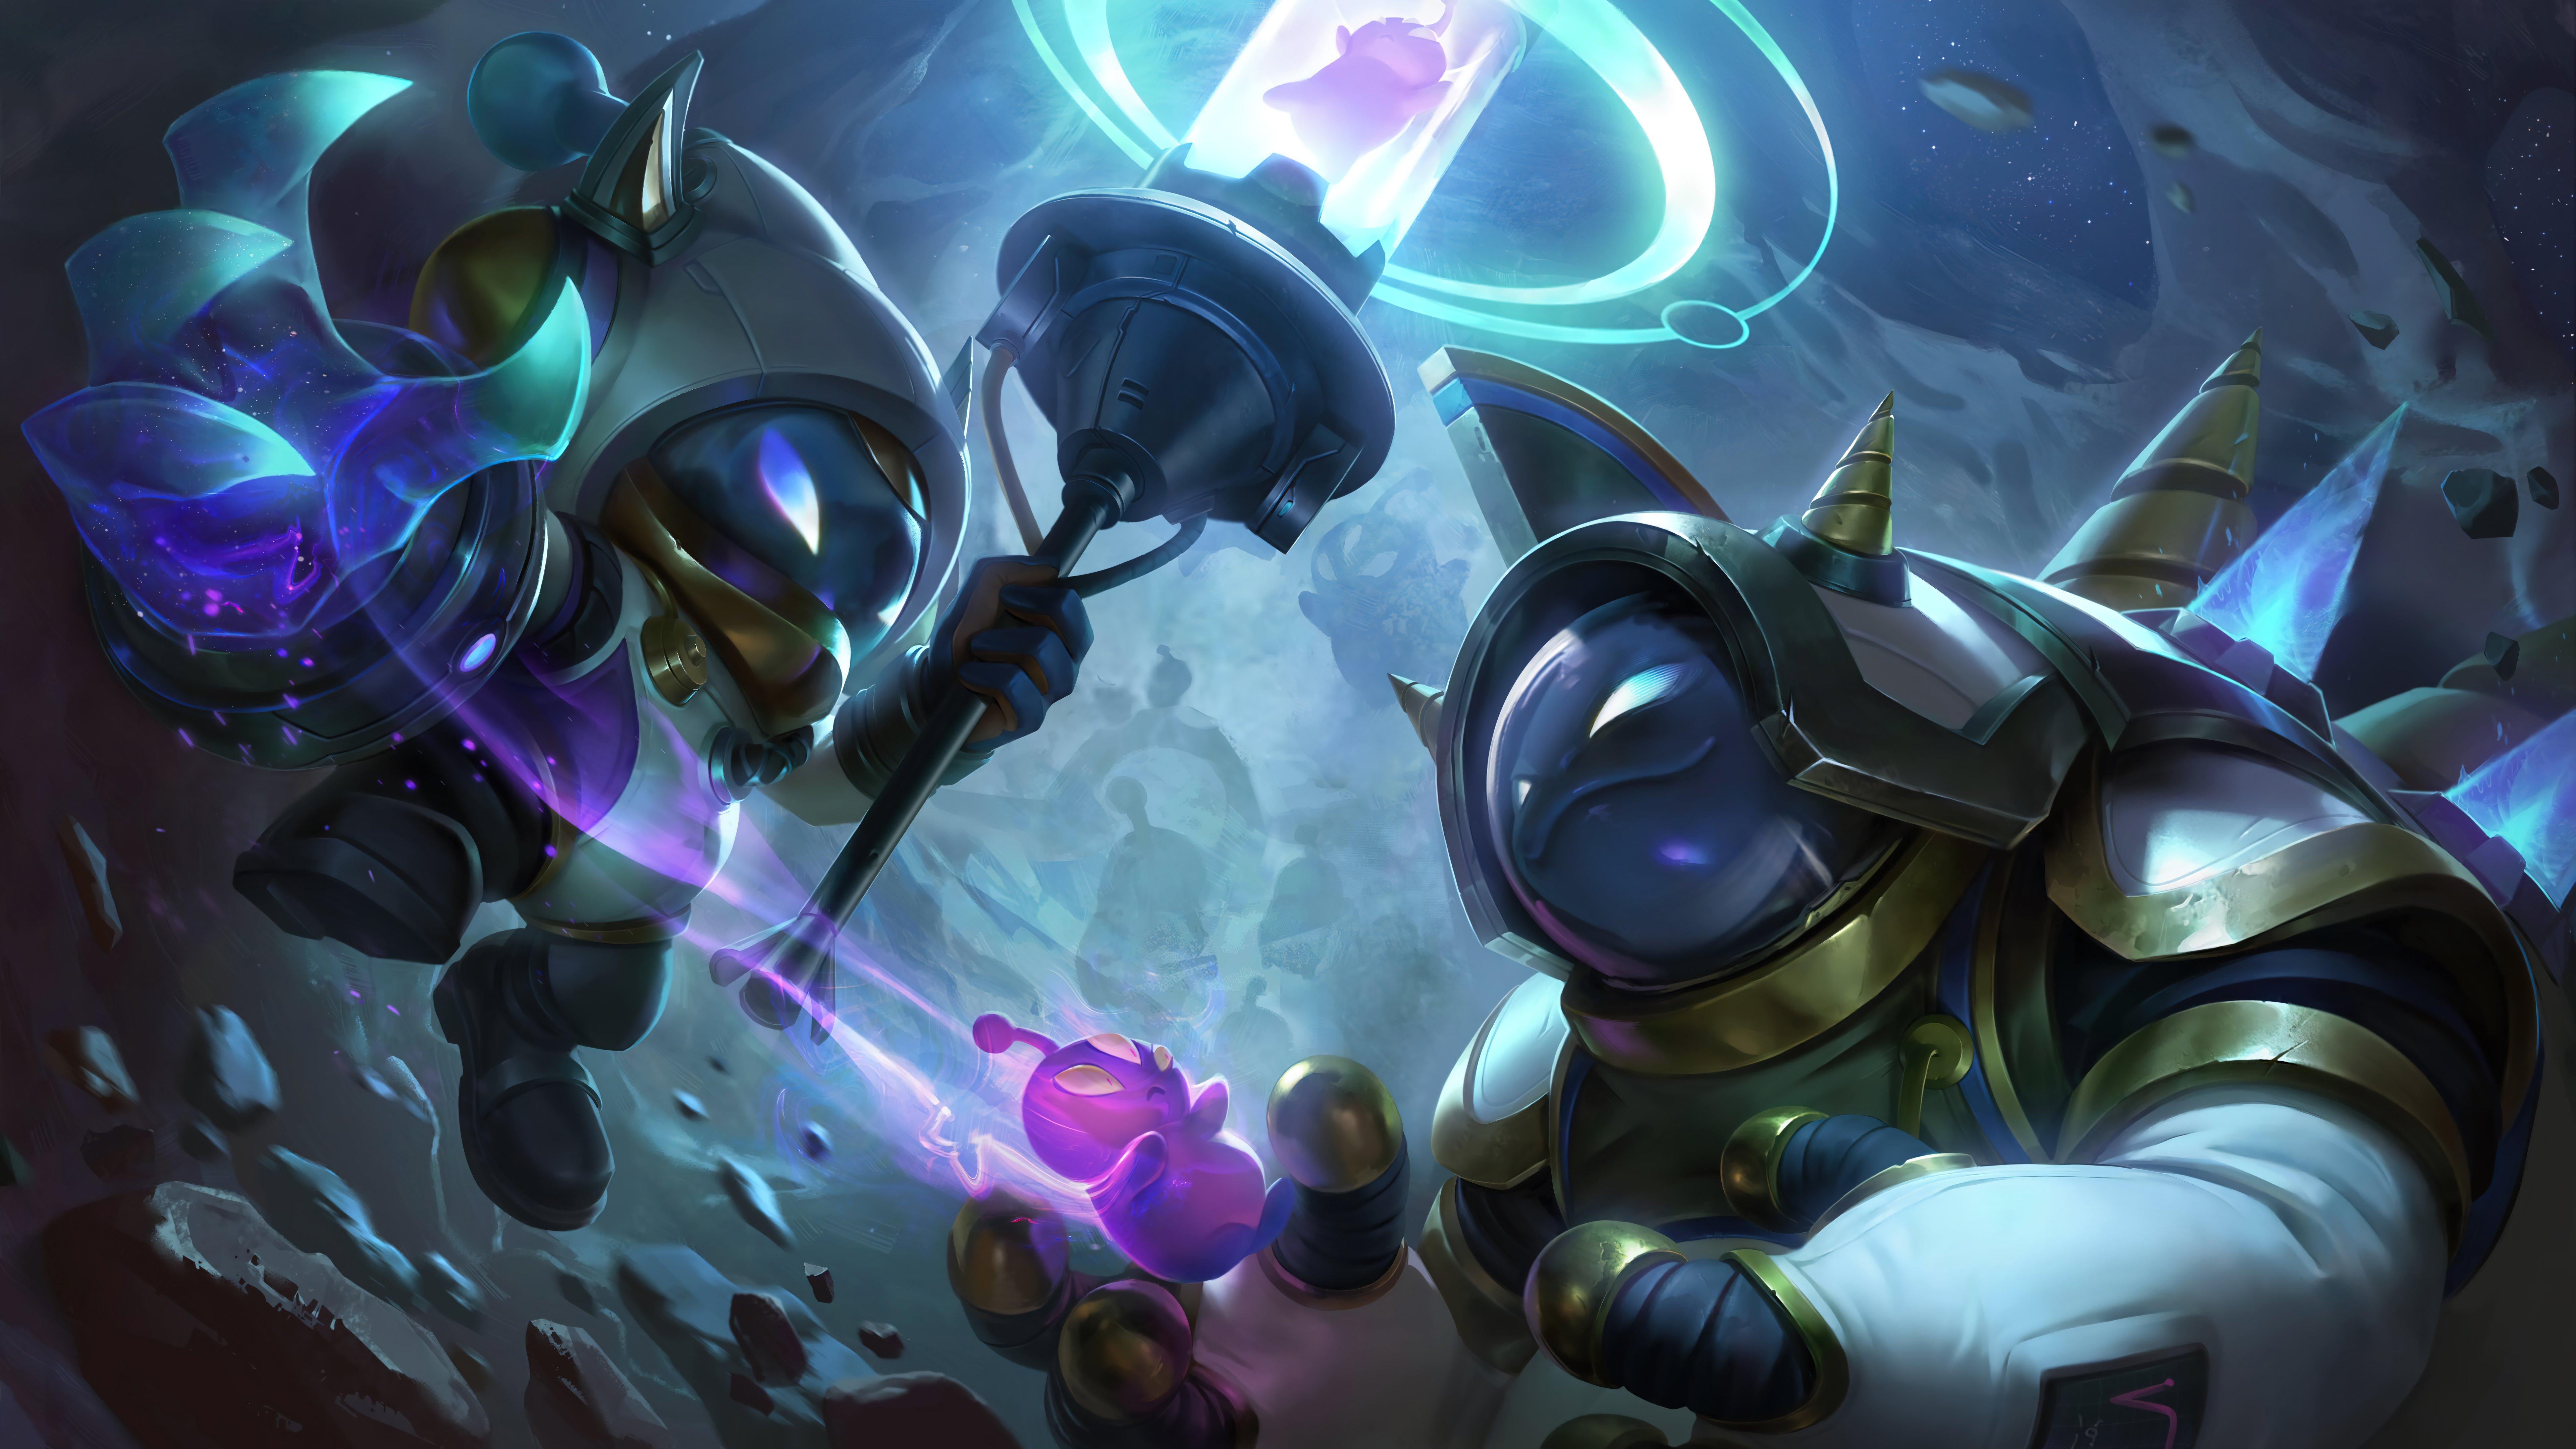 Fondos de pantalla Astronauta Veigar y Rammus League of Legends Splash Art